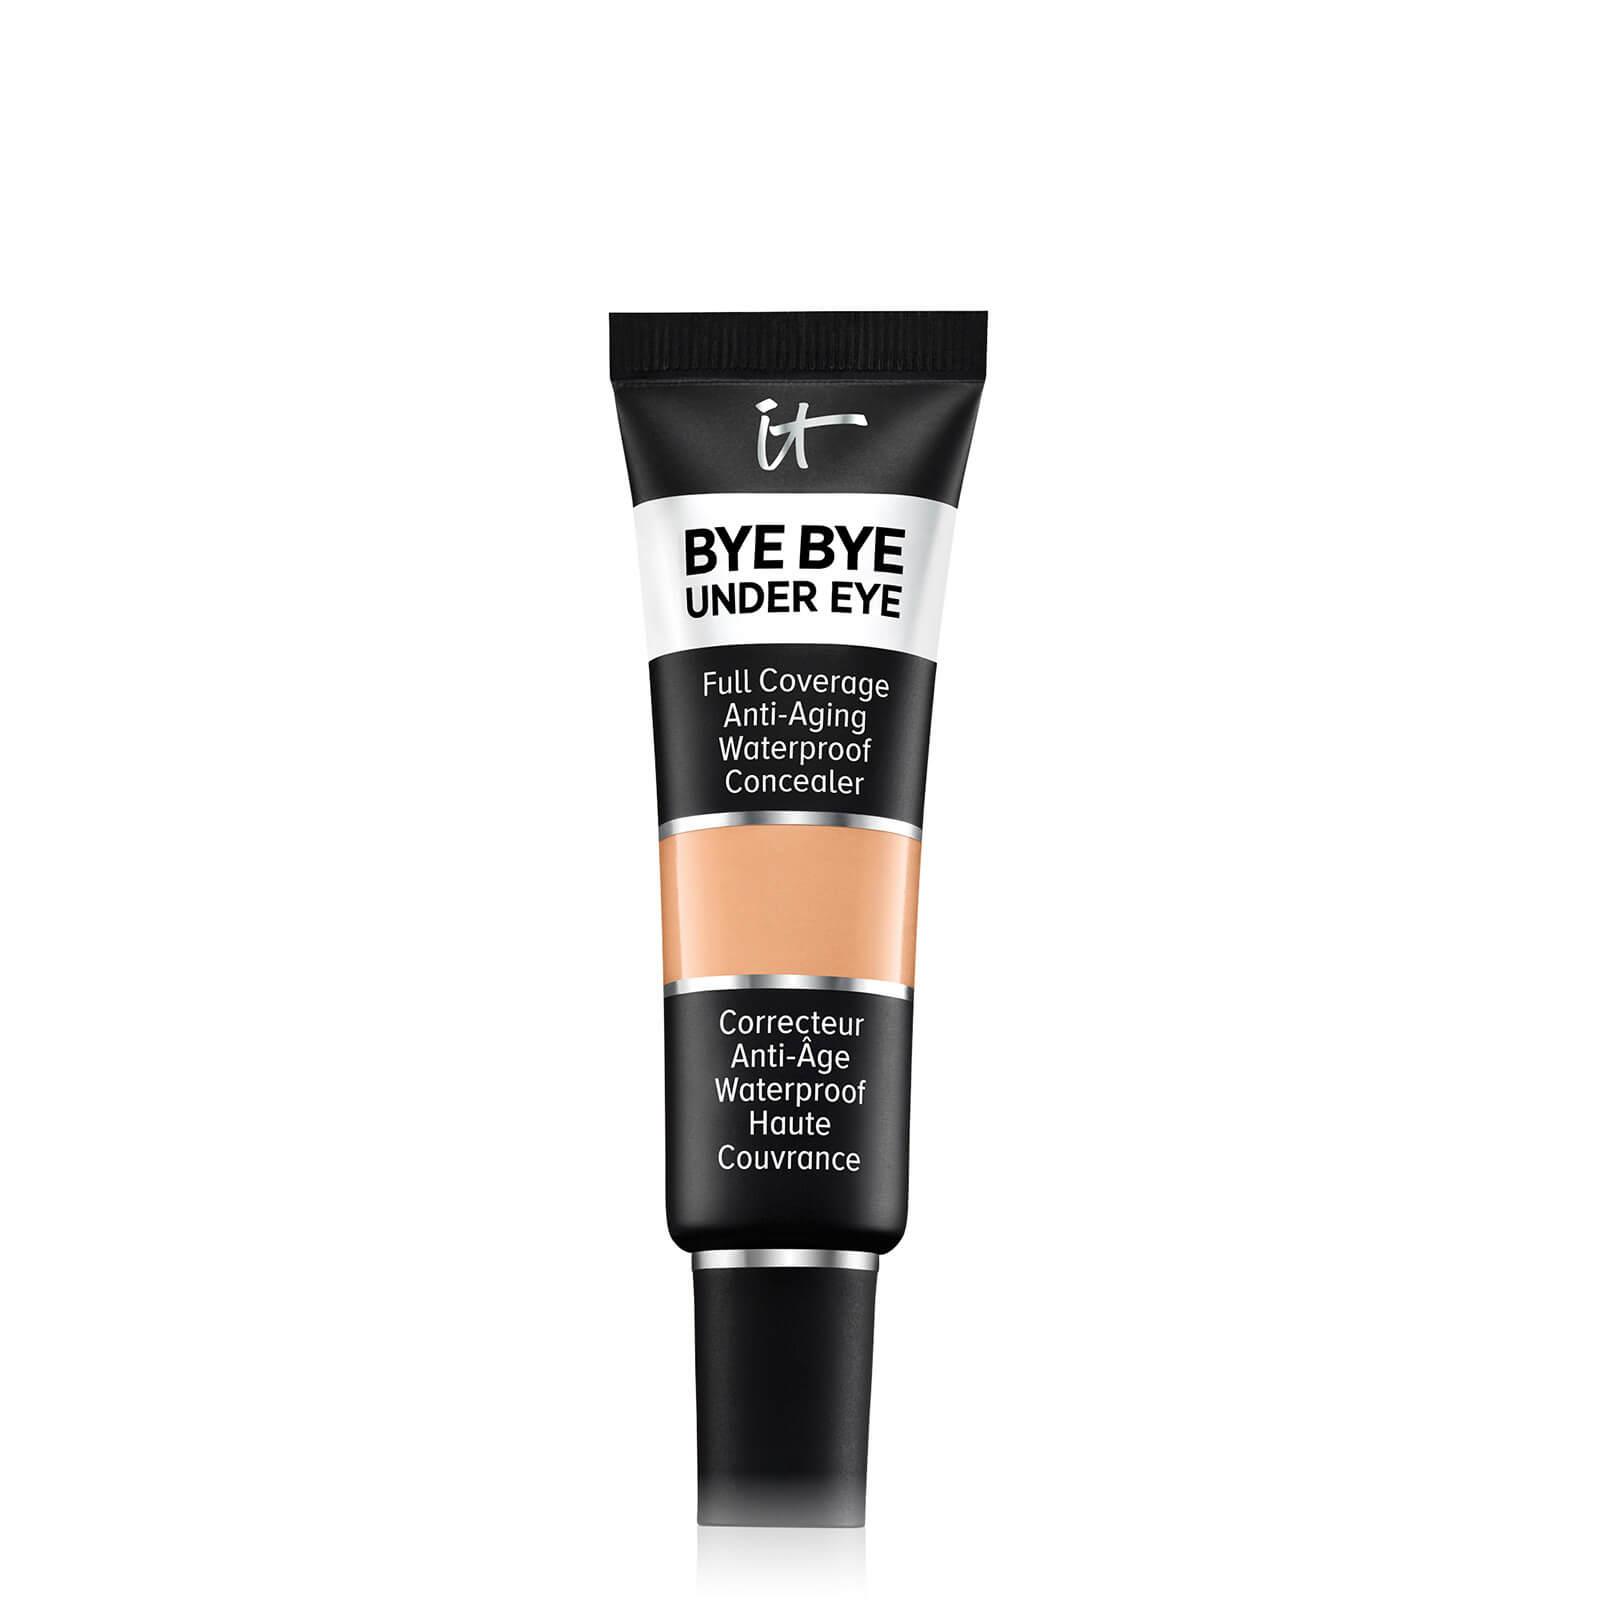 Купить IT Cosmetics Bye Bye Under Eye Concealer 12ml (Various Shades) - Medium Bronze